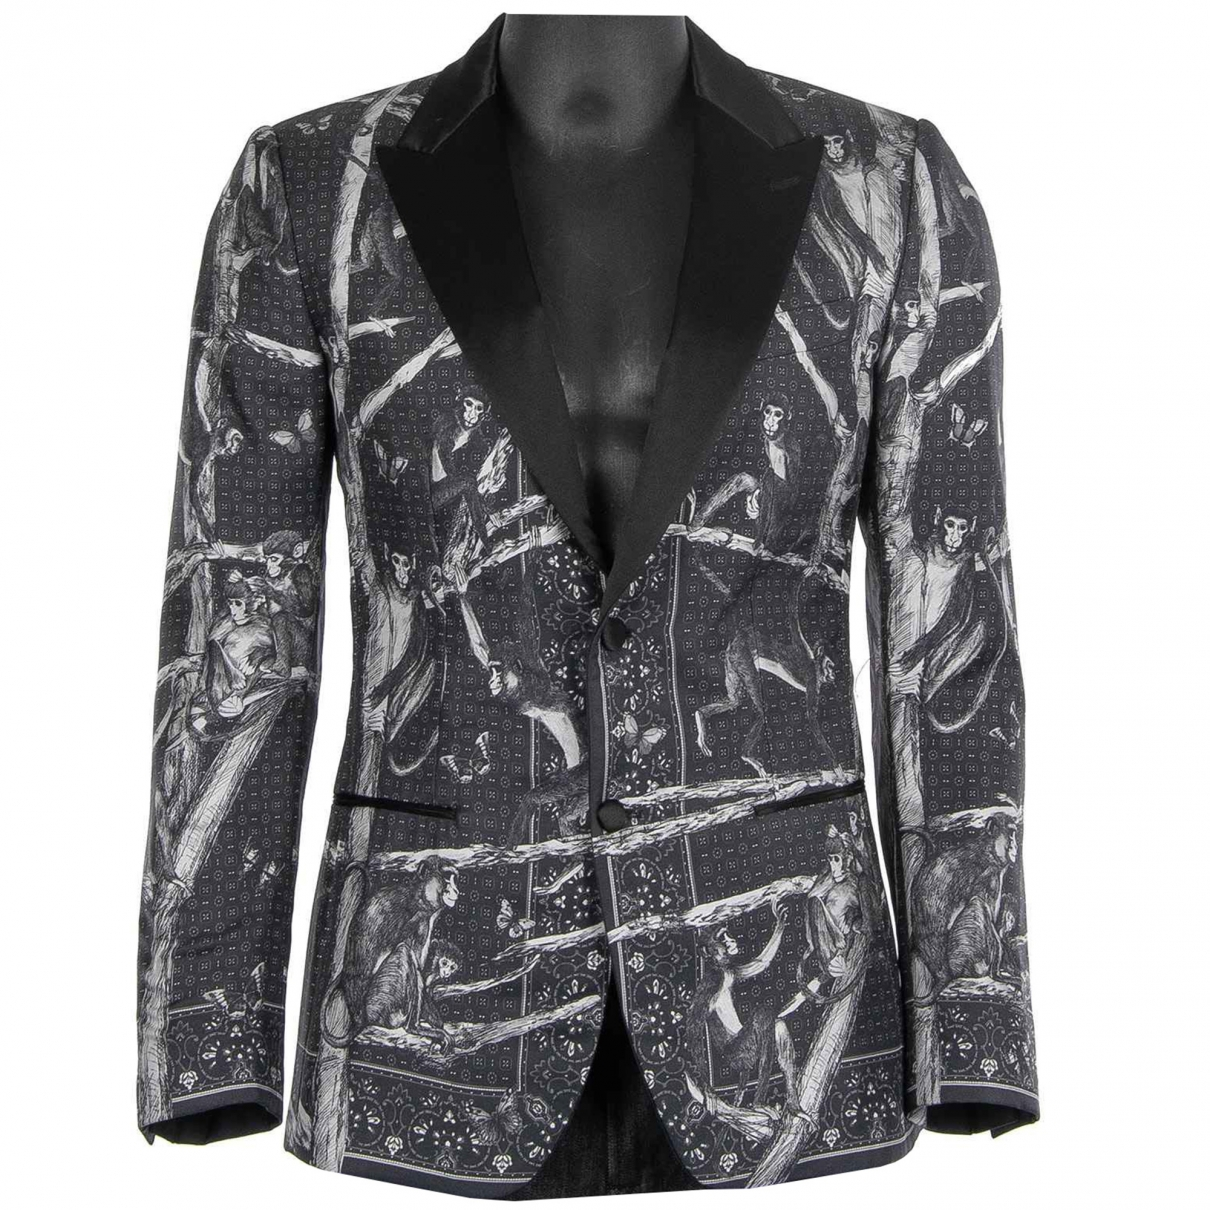 Dolce & Gabbana \N Jacke in  Grau Seide